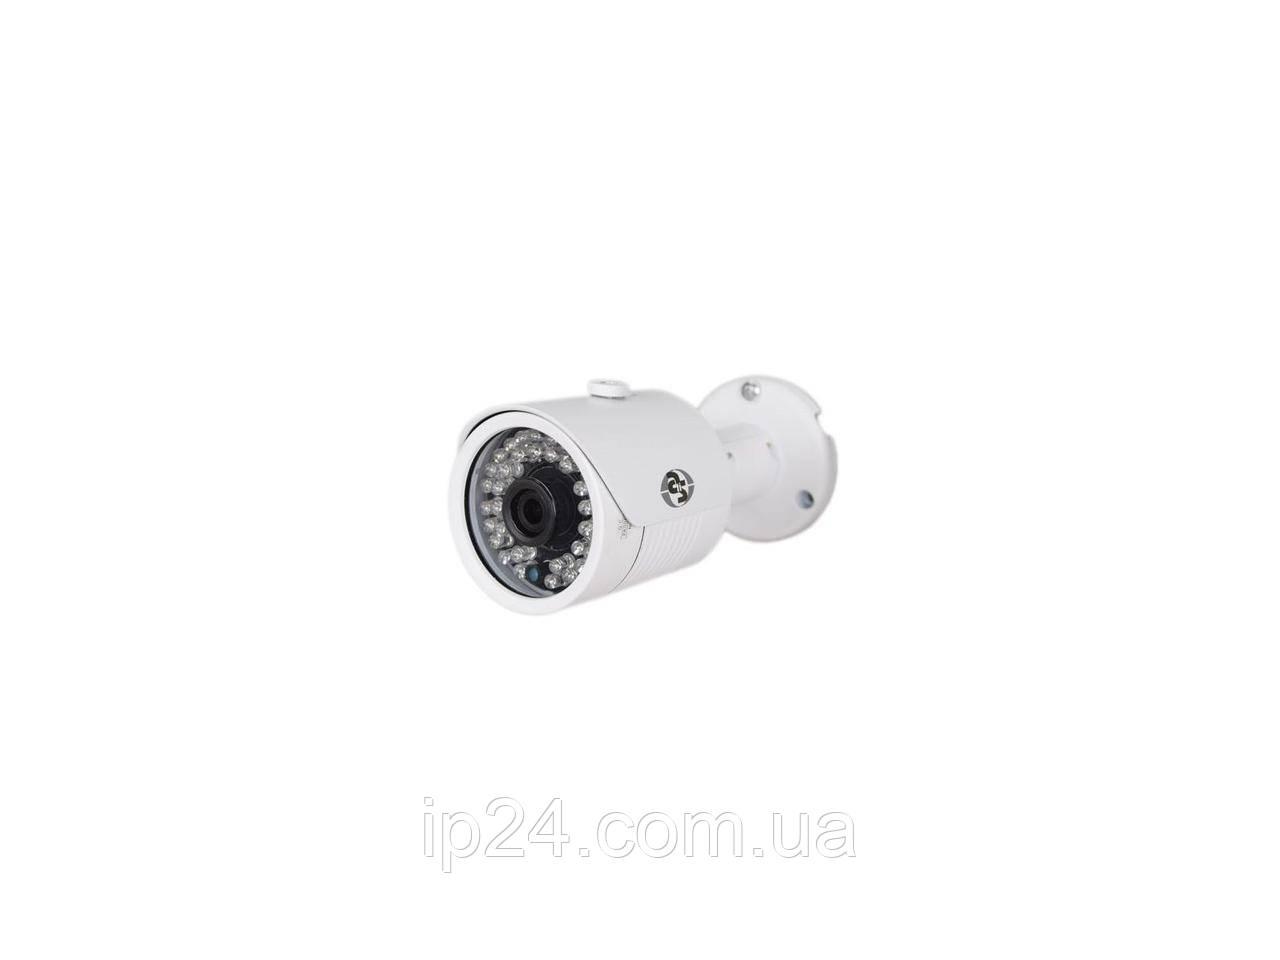 IP-видеокамера Atis ANW-2MIR-30W/3,6